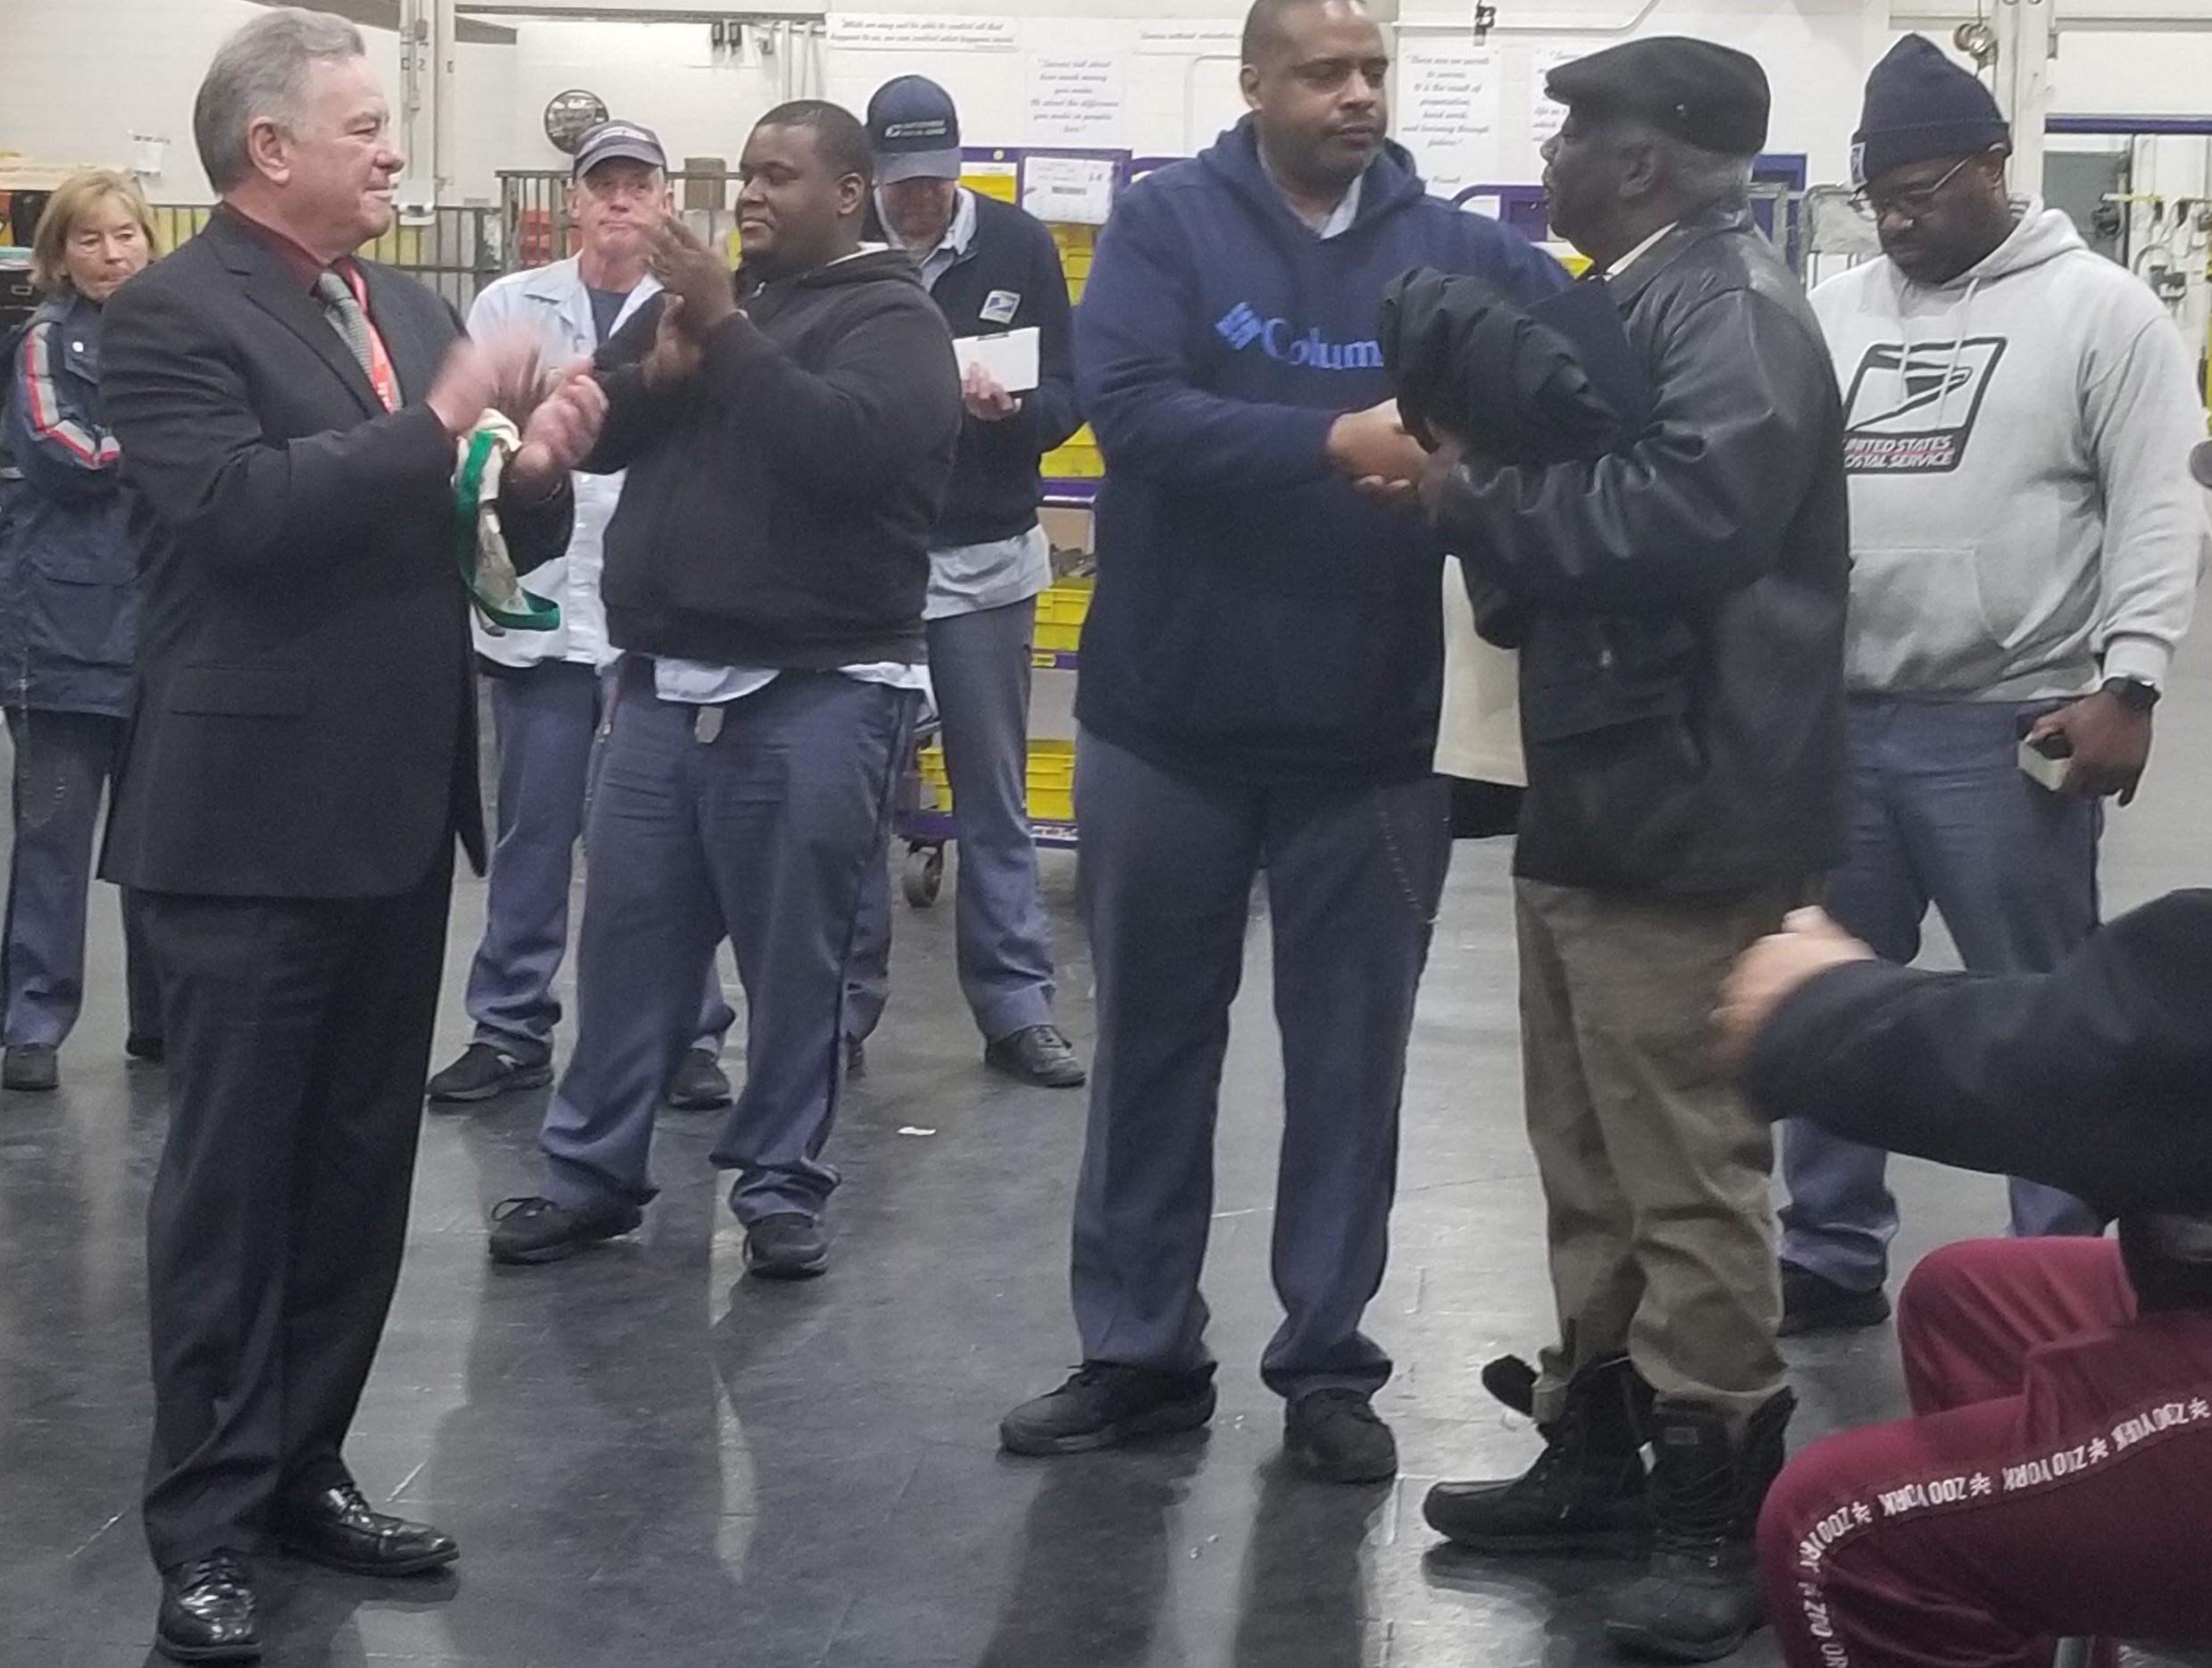 Shop-Steward-Keith-Meredith-Roxbury-Retiree-Bernard-Washington-along-with-President-Jerry-McCarthy-Copy-2